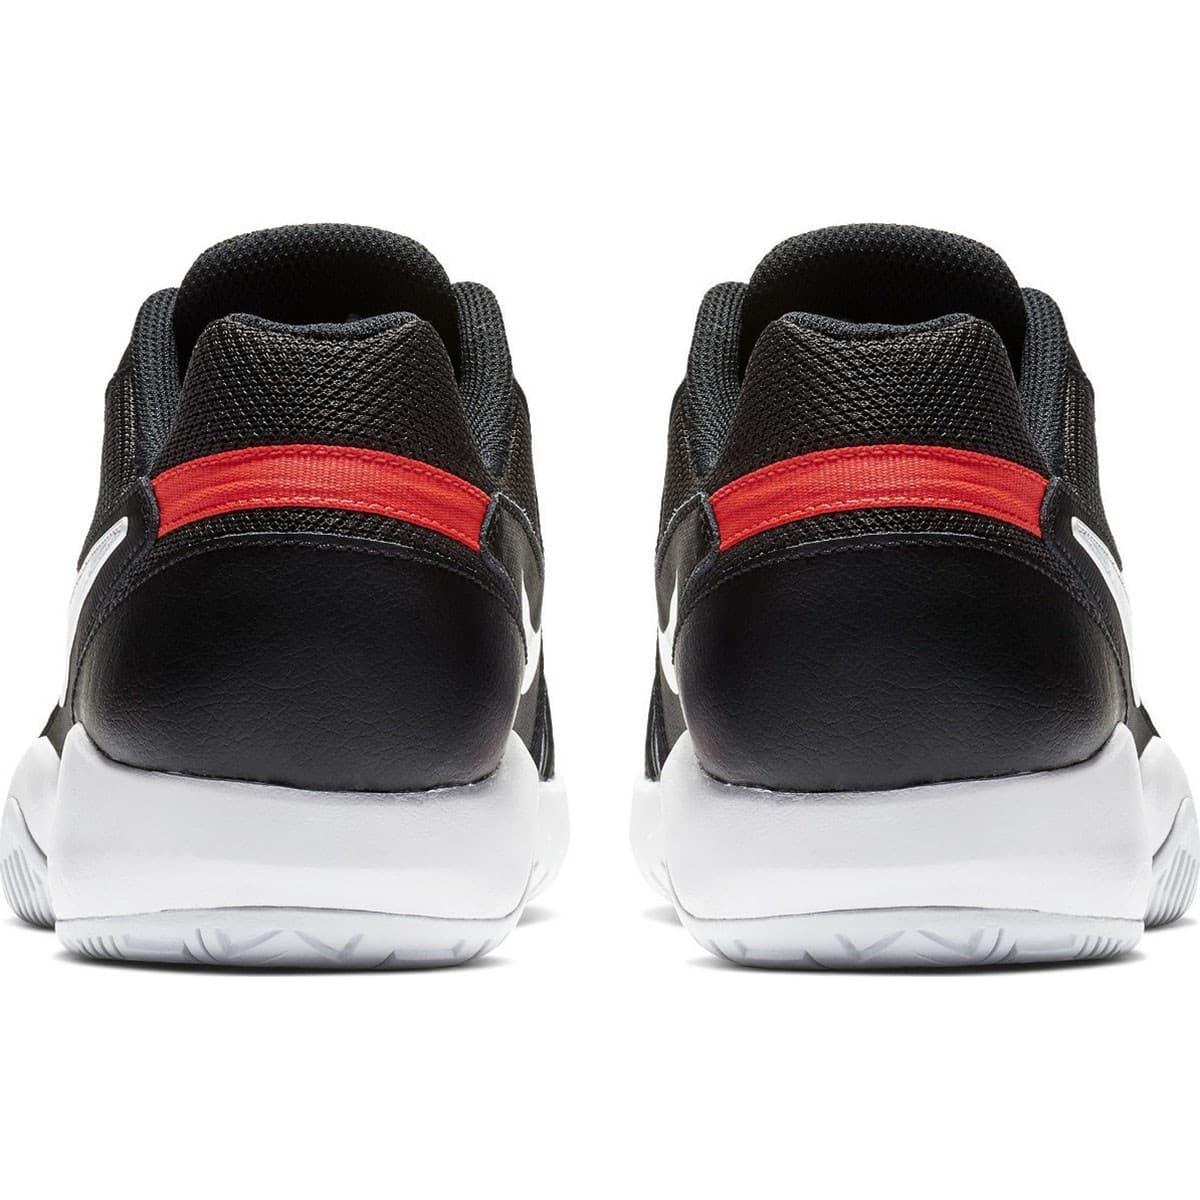 Air Zoom Resistance Siyah Tenis Ayakkabısı